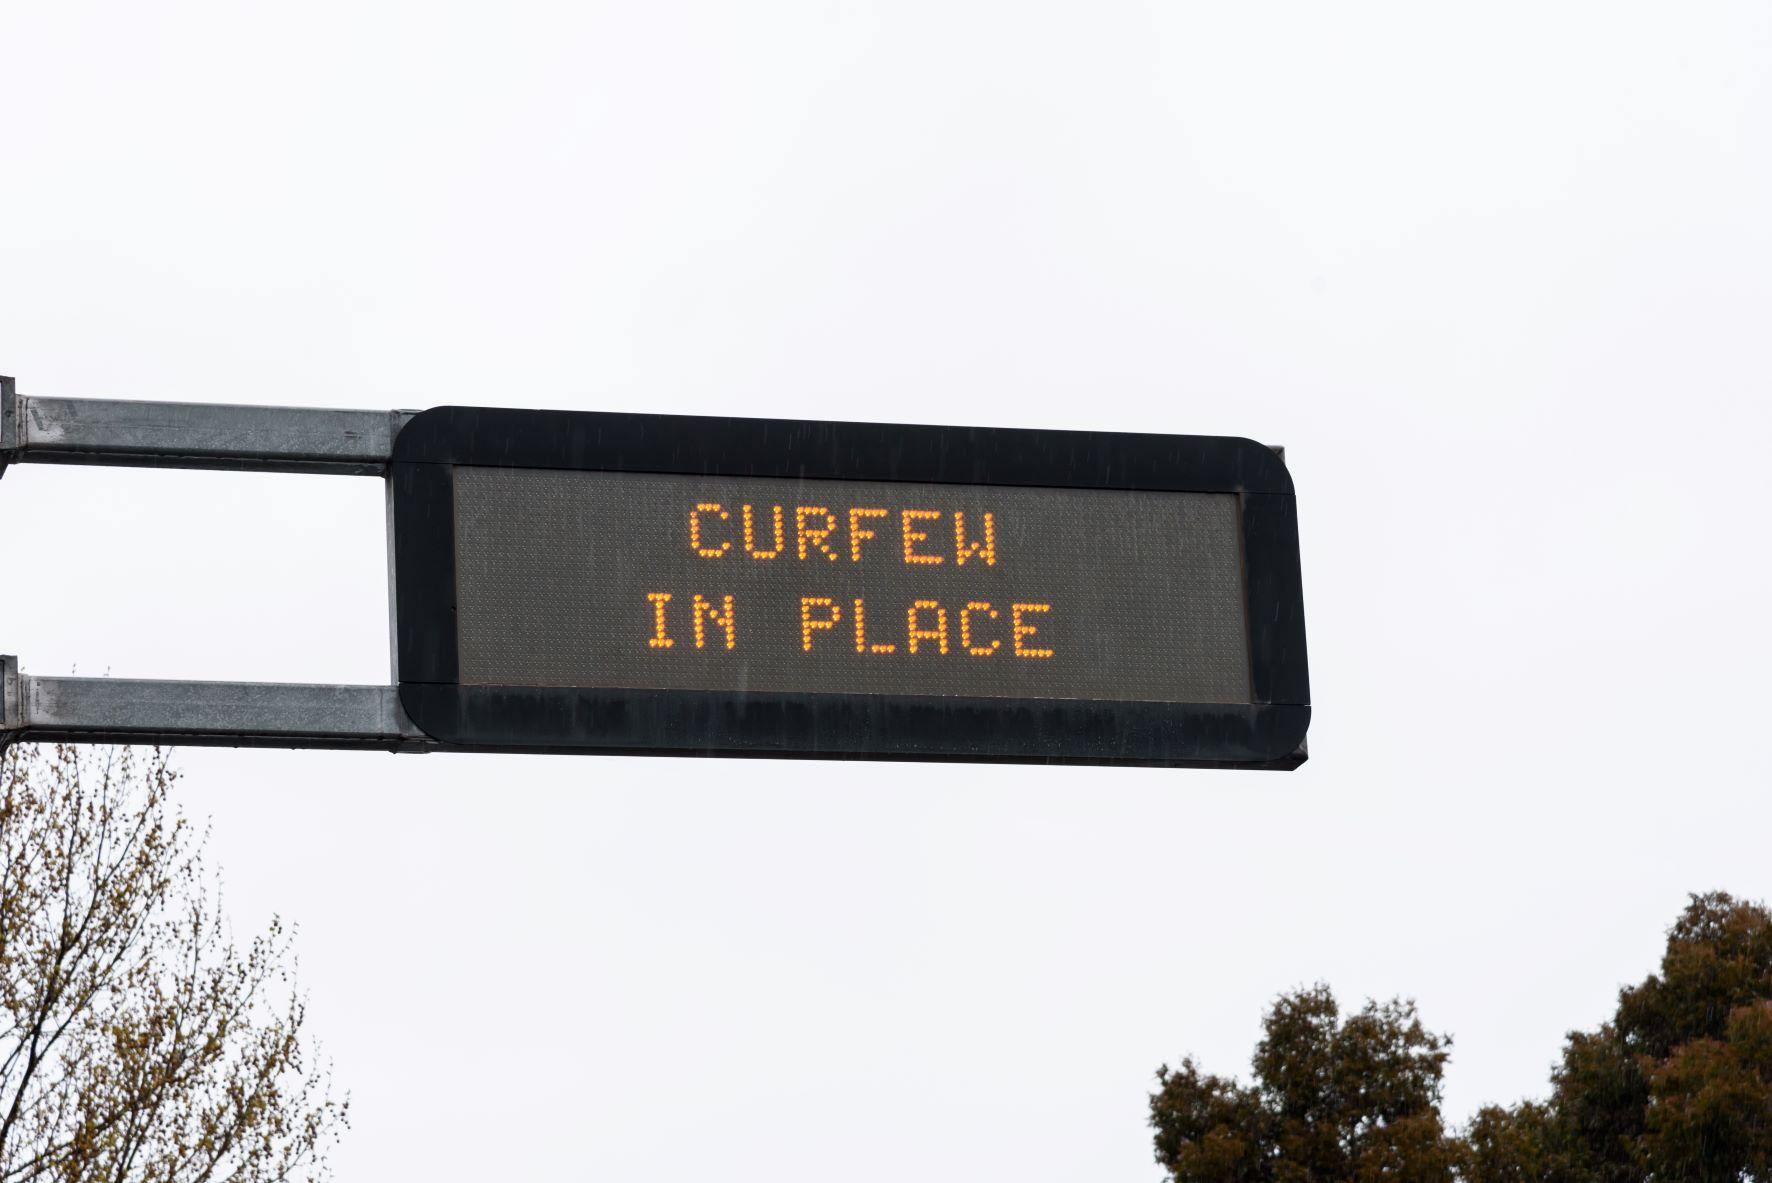 Melbourne curfew sign